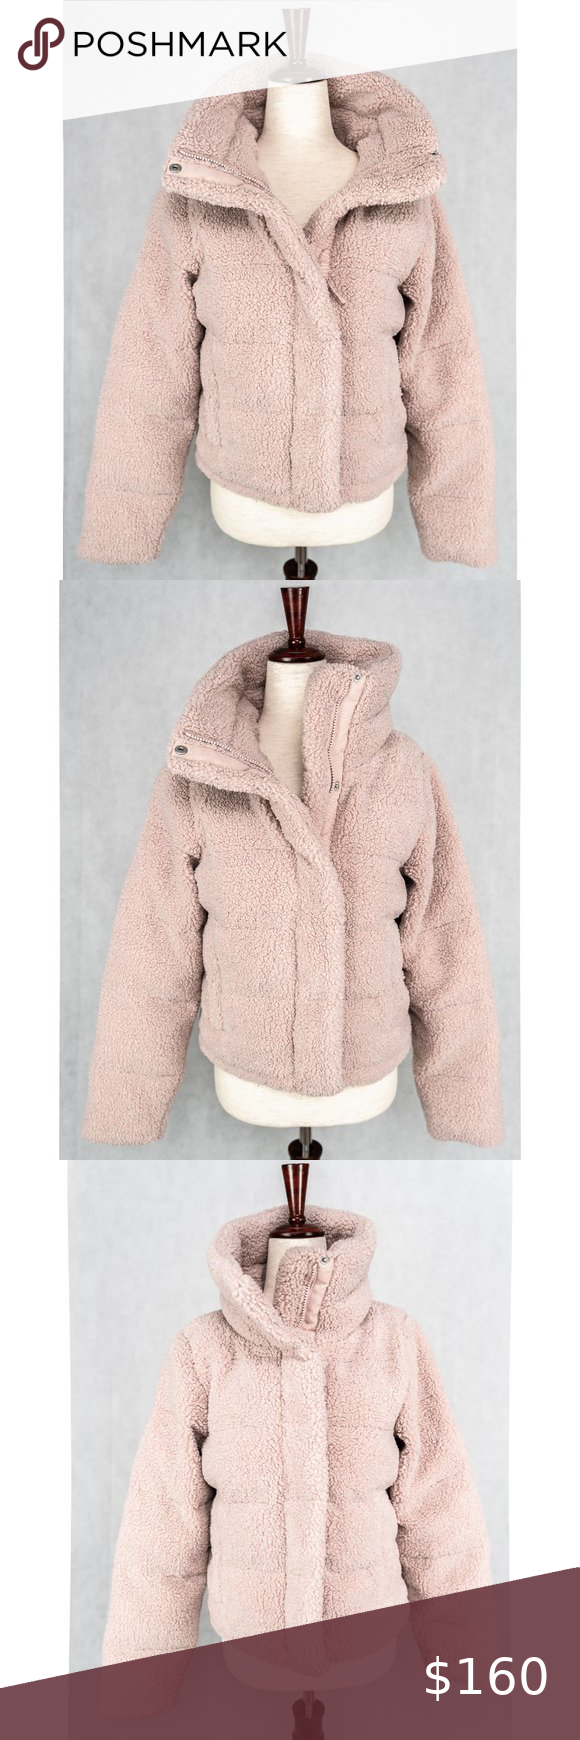 A F Mini Sherpa Fleece Cropped Puffer Jacket 160 Cropped Puffer Jacket Clothes Design Abercrombie And Fitch Jackets [ 1740 x 580 Pixel ]